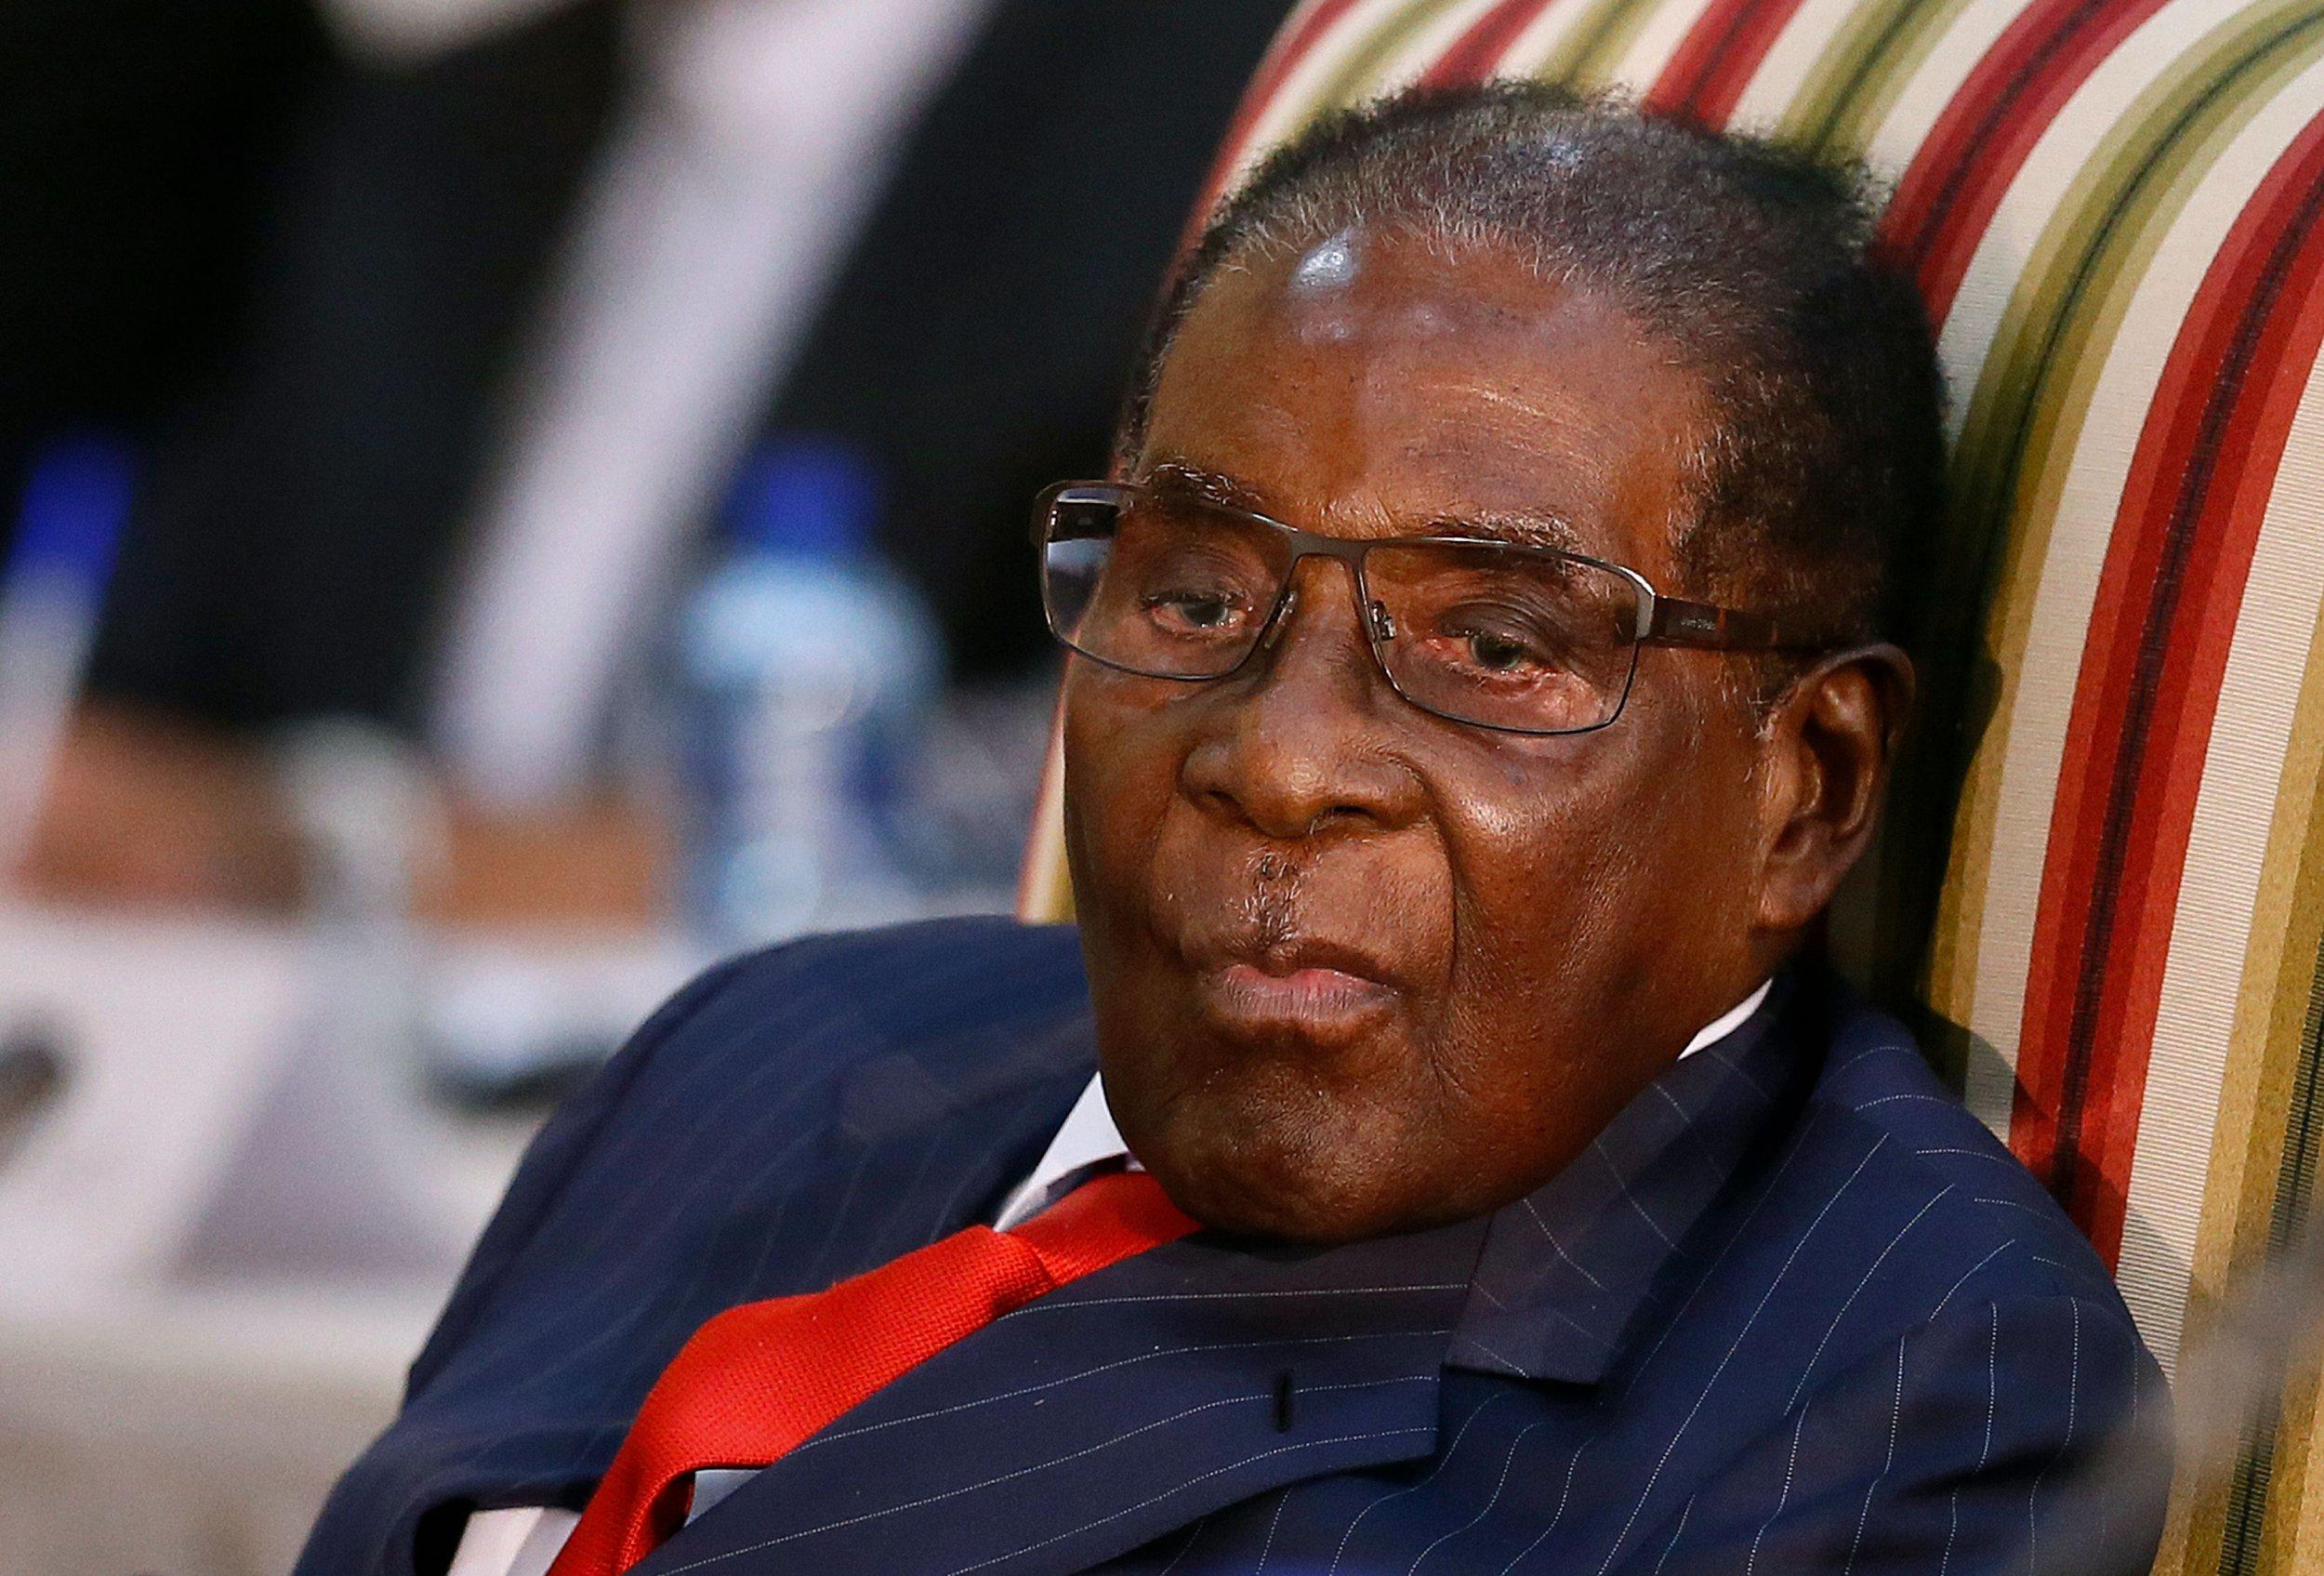 Robert Mugabe to be named 'Goodwill Ambassador' despite human right's abuses